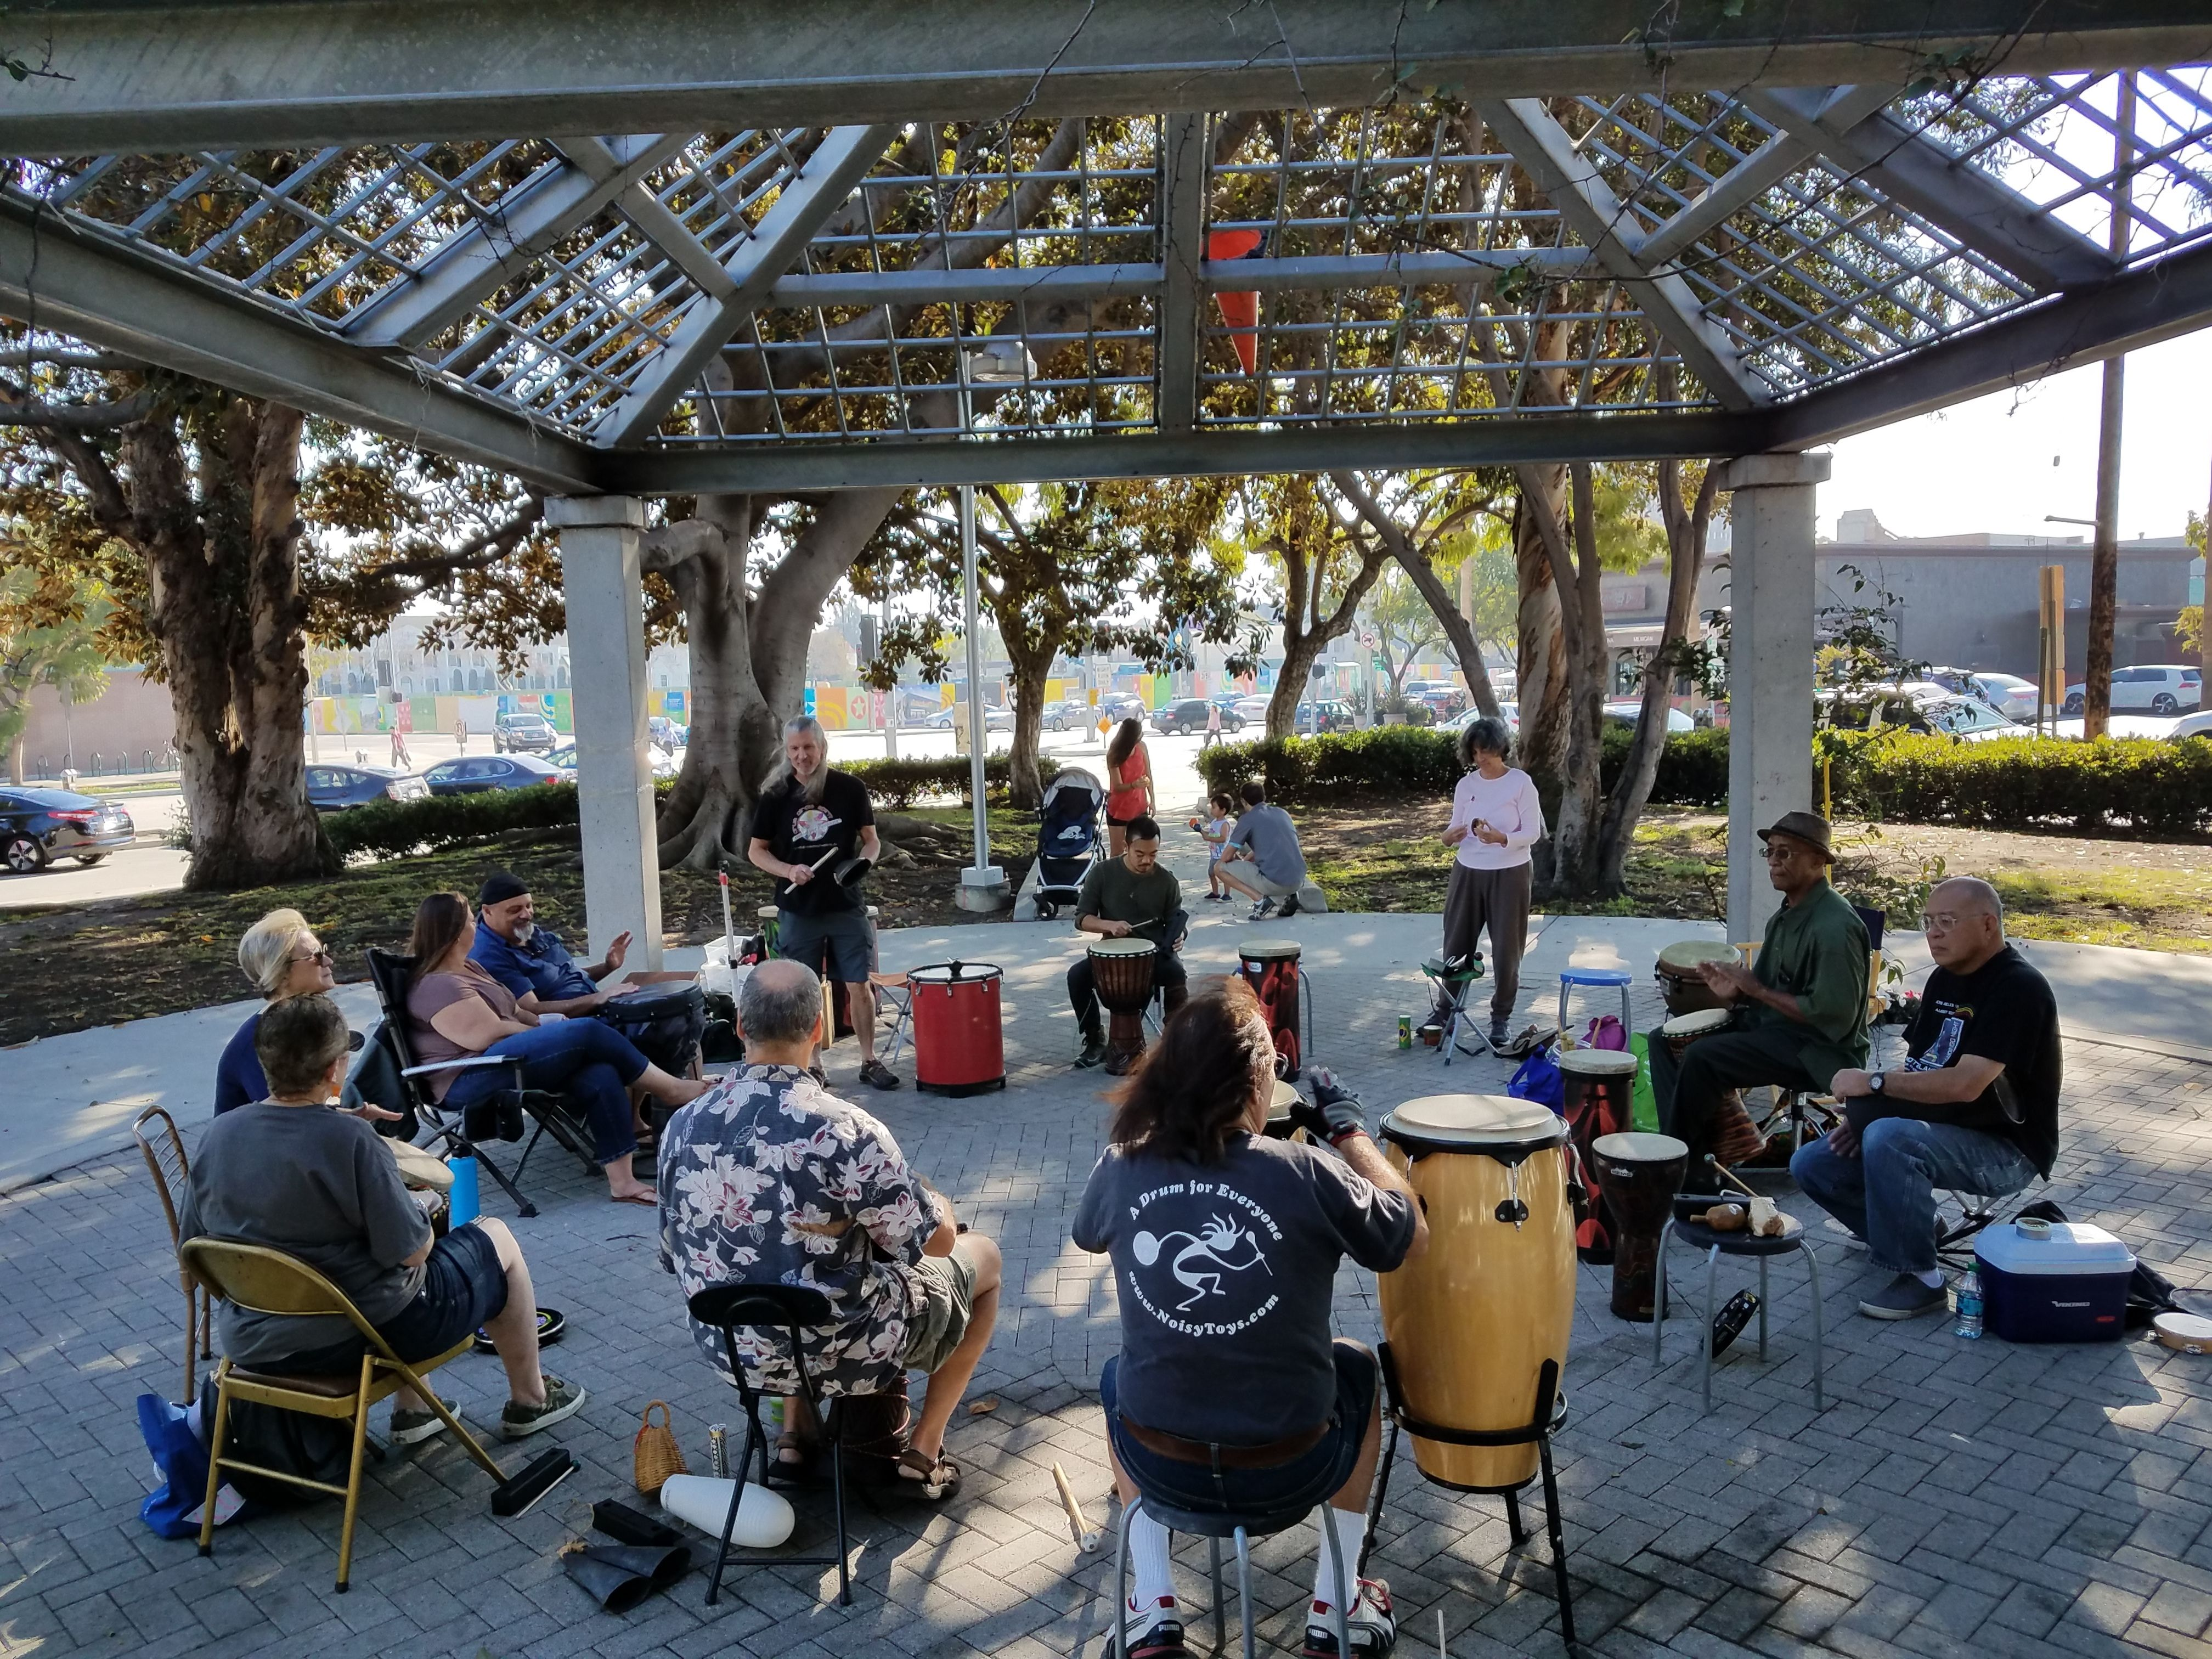 The Culver City Drum Circle Meetup